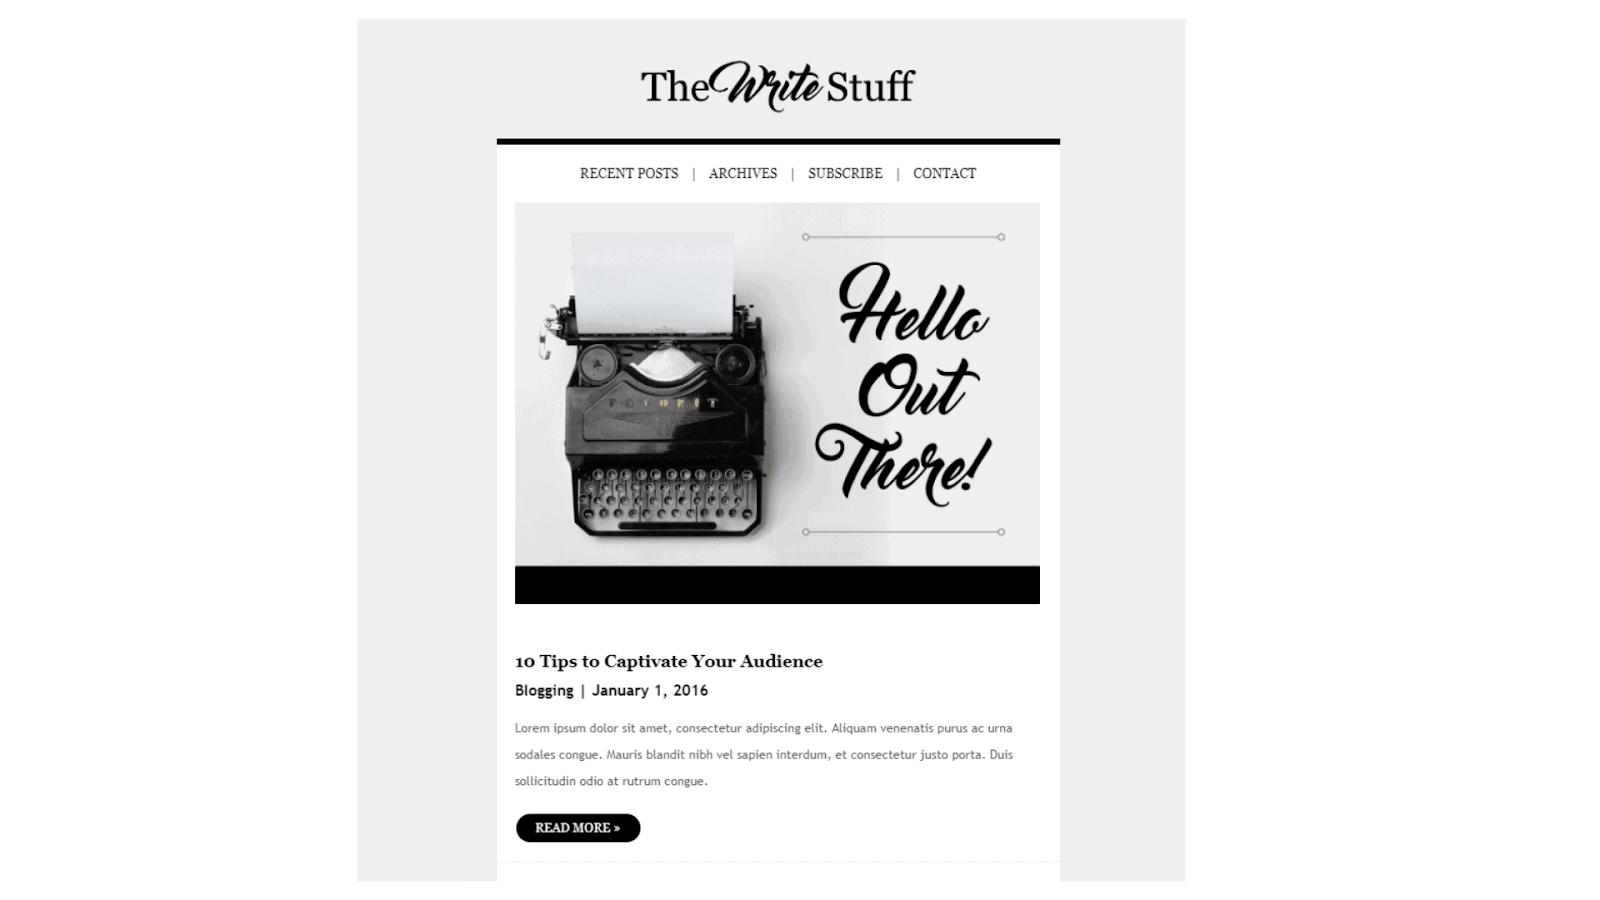 Sendinblue Publishing/Blogging template.